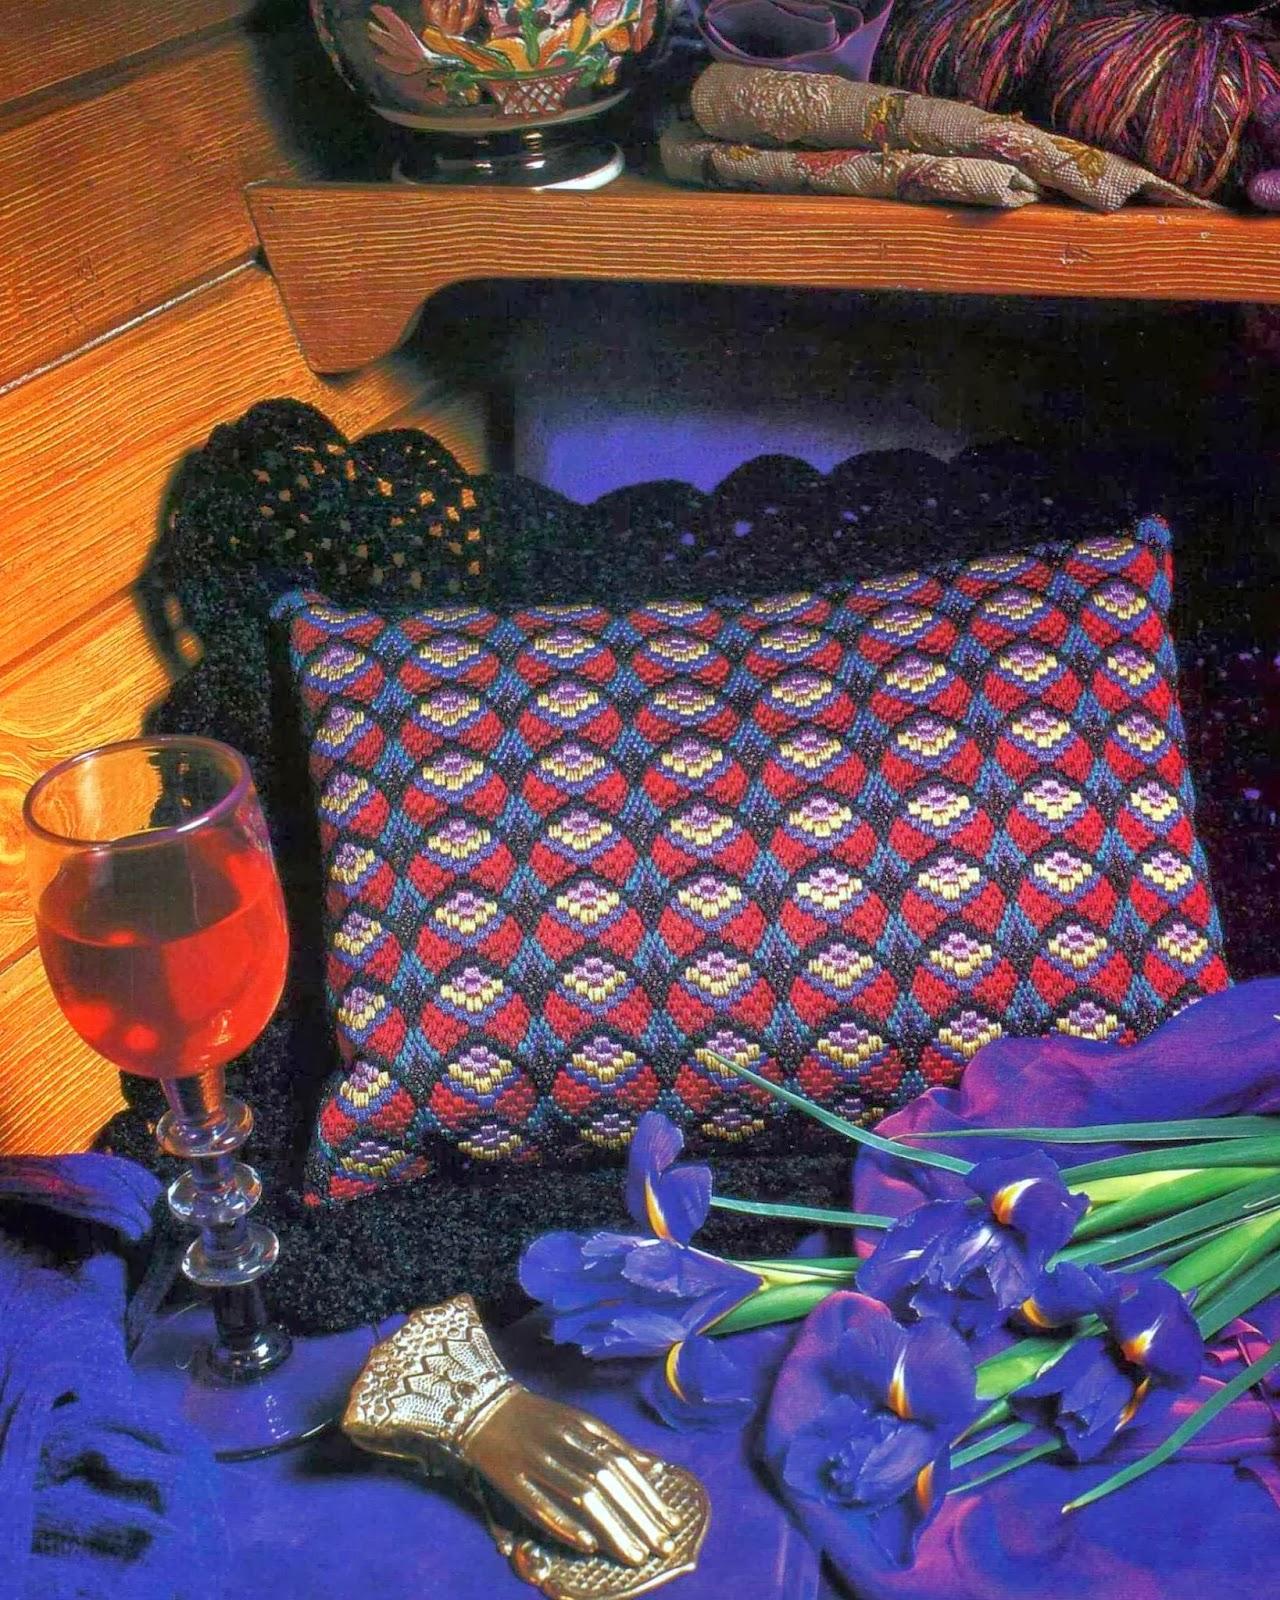 Милые сердцу штучки вышивка барджелло 47